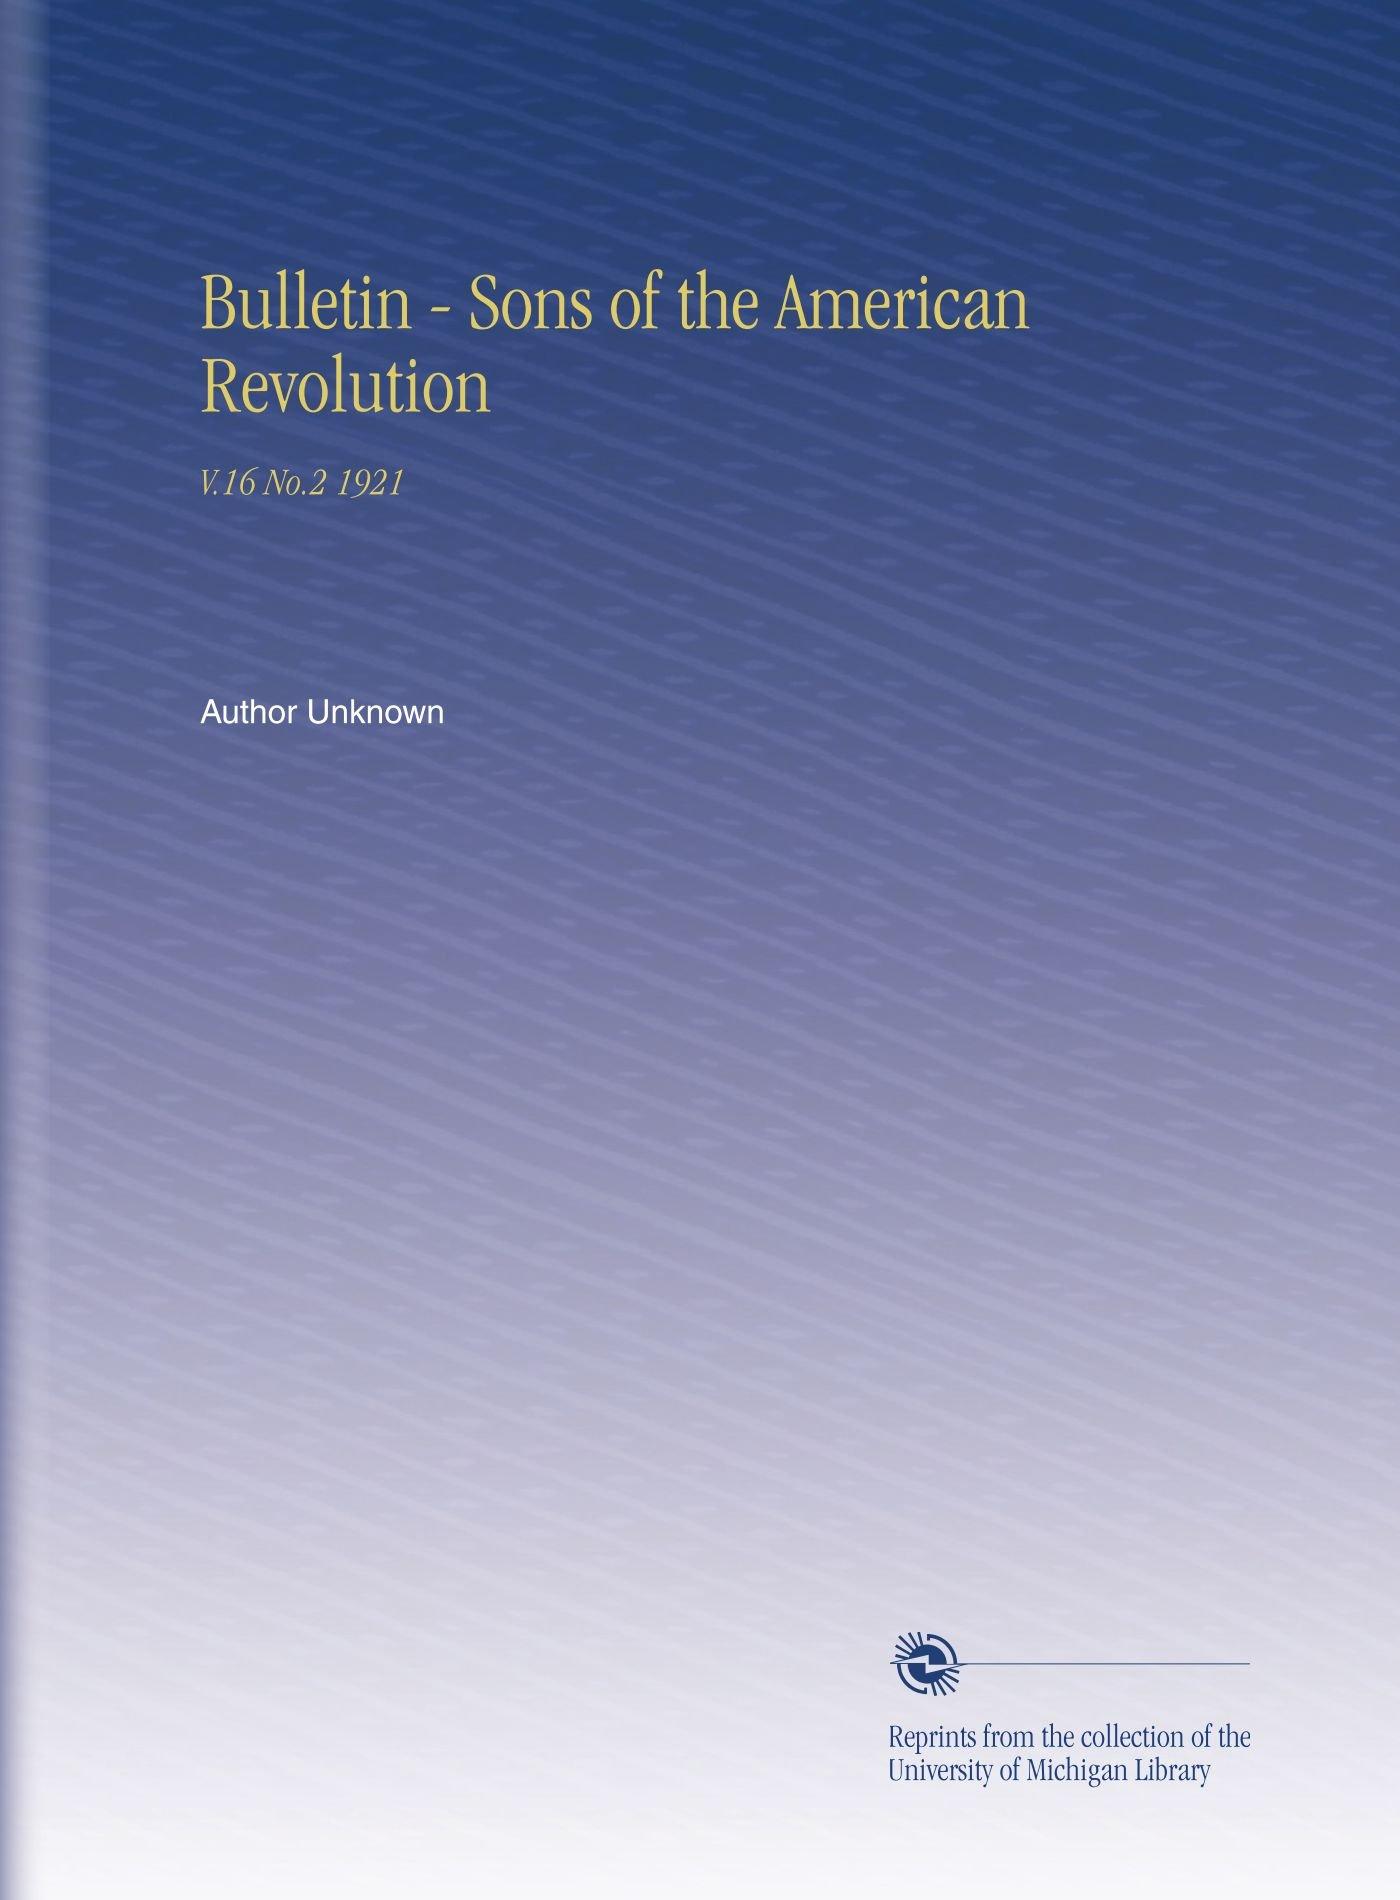 Bulletin - Sons of the American Revolution: V.16 No.2 1921 ebook